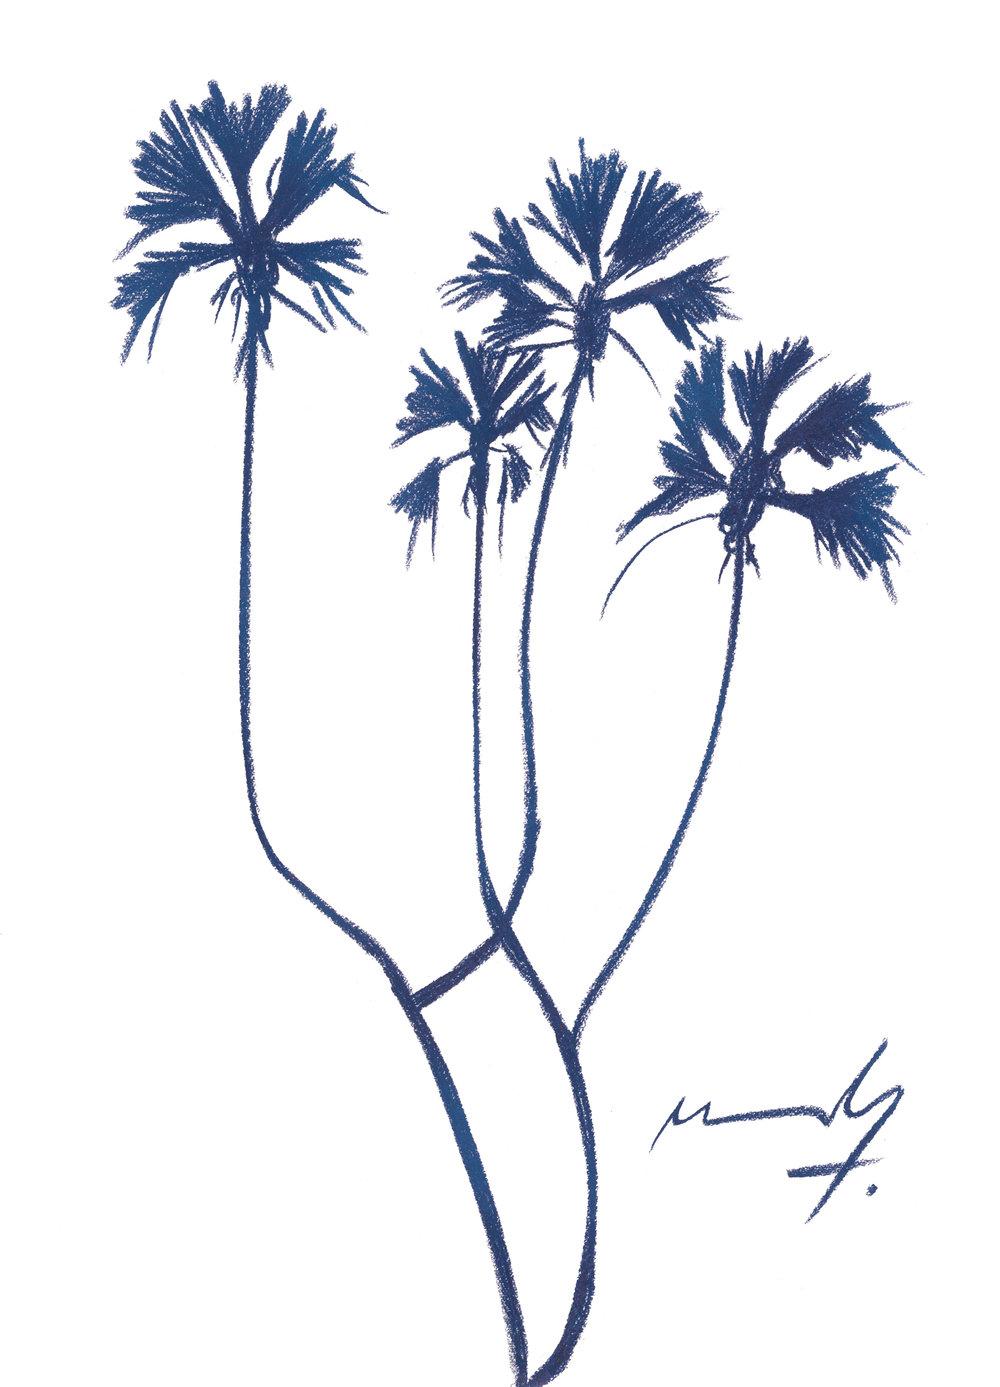 STUDY OF DOUM PALM TREE